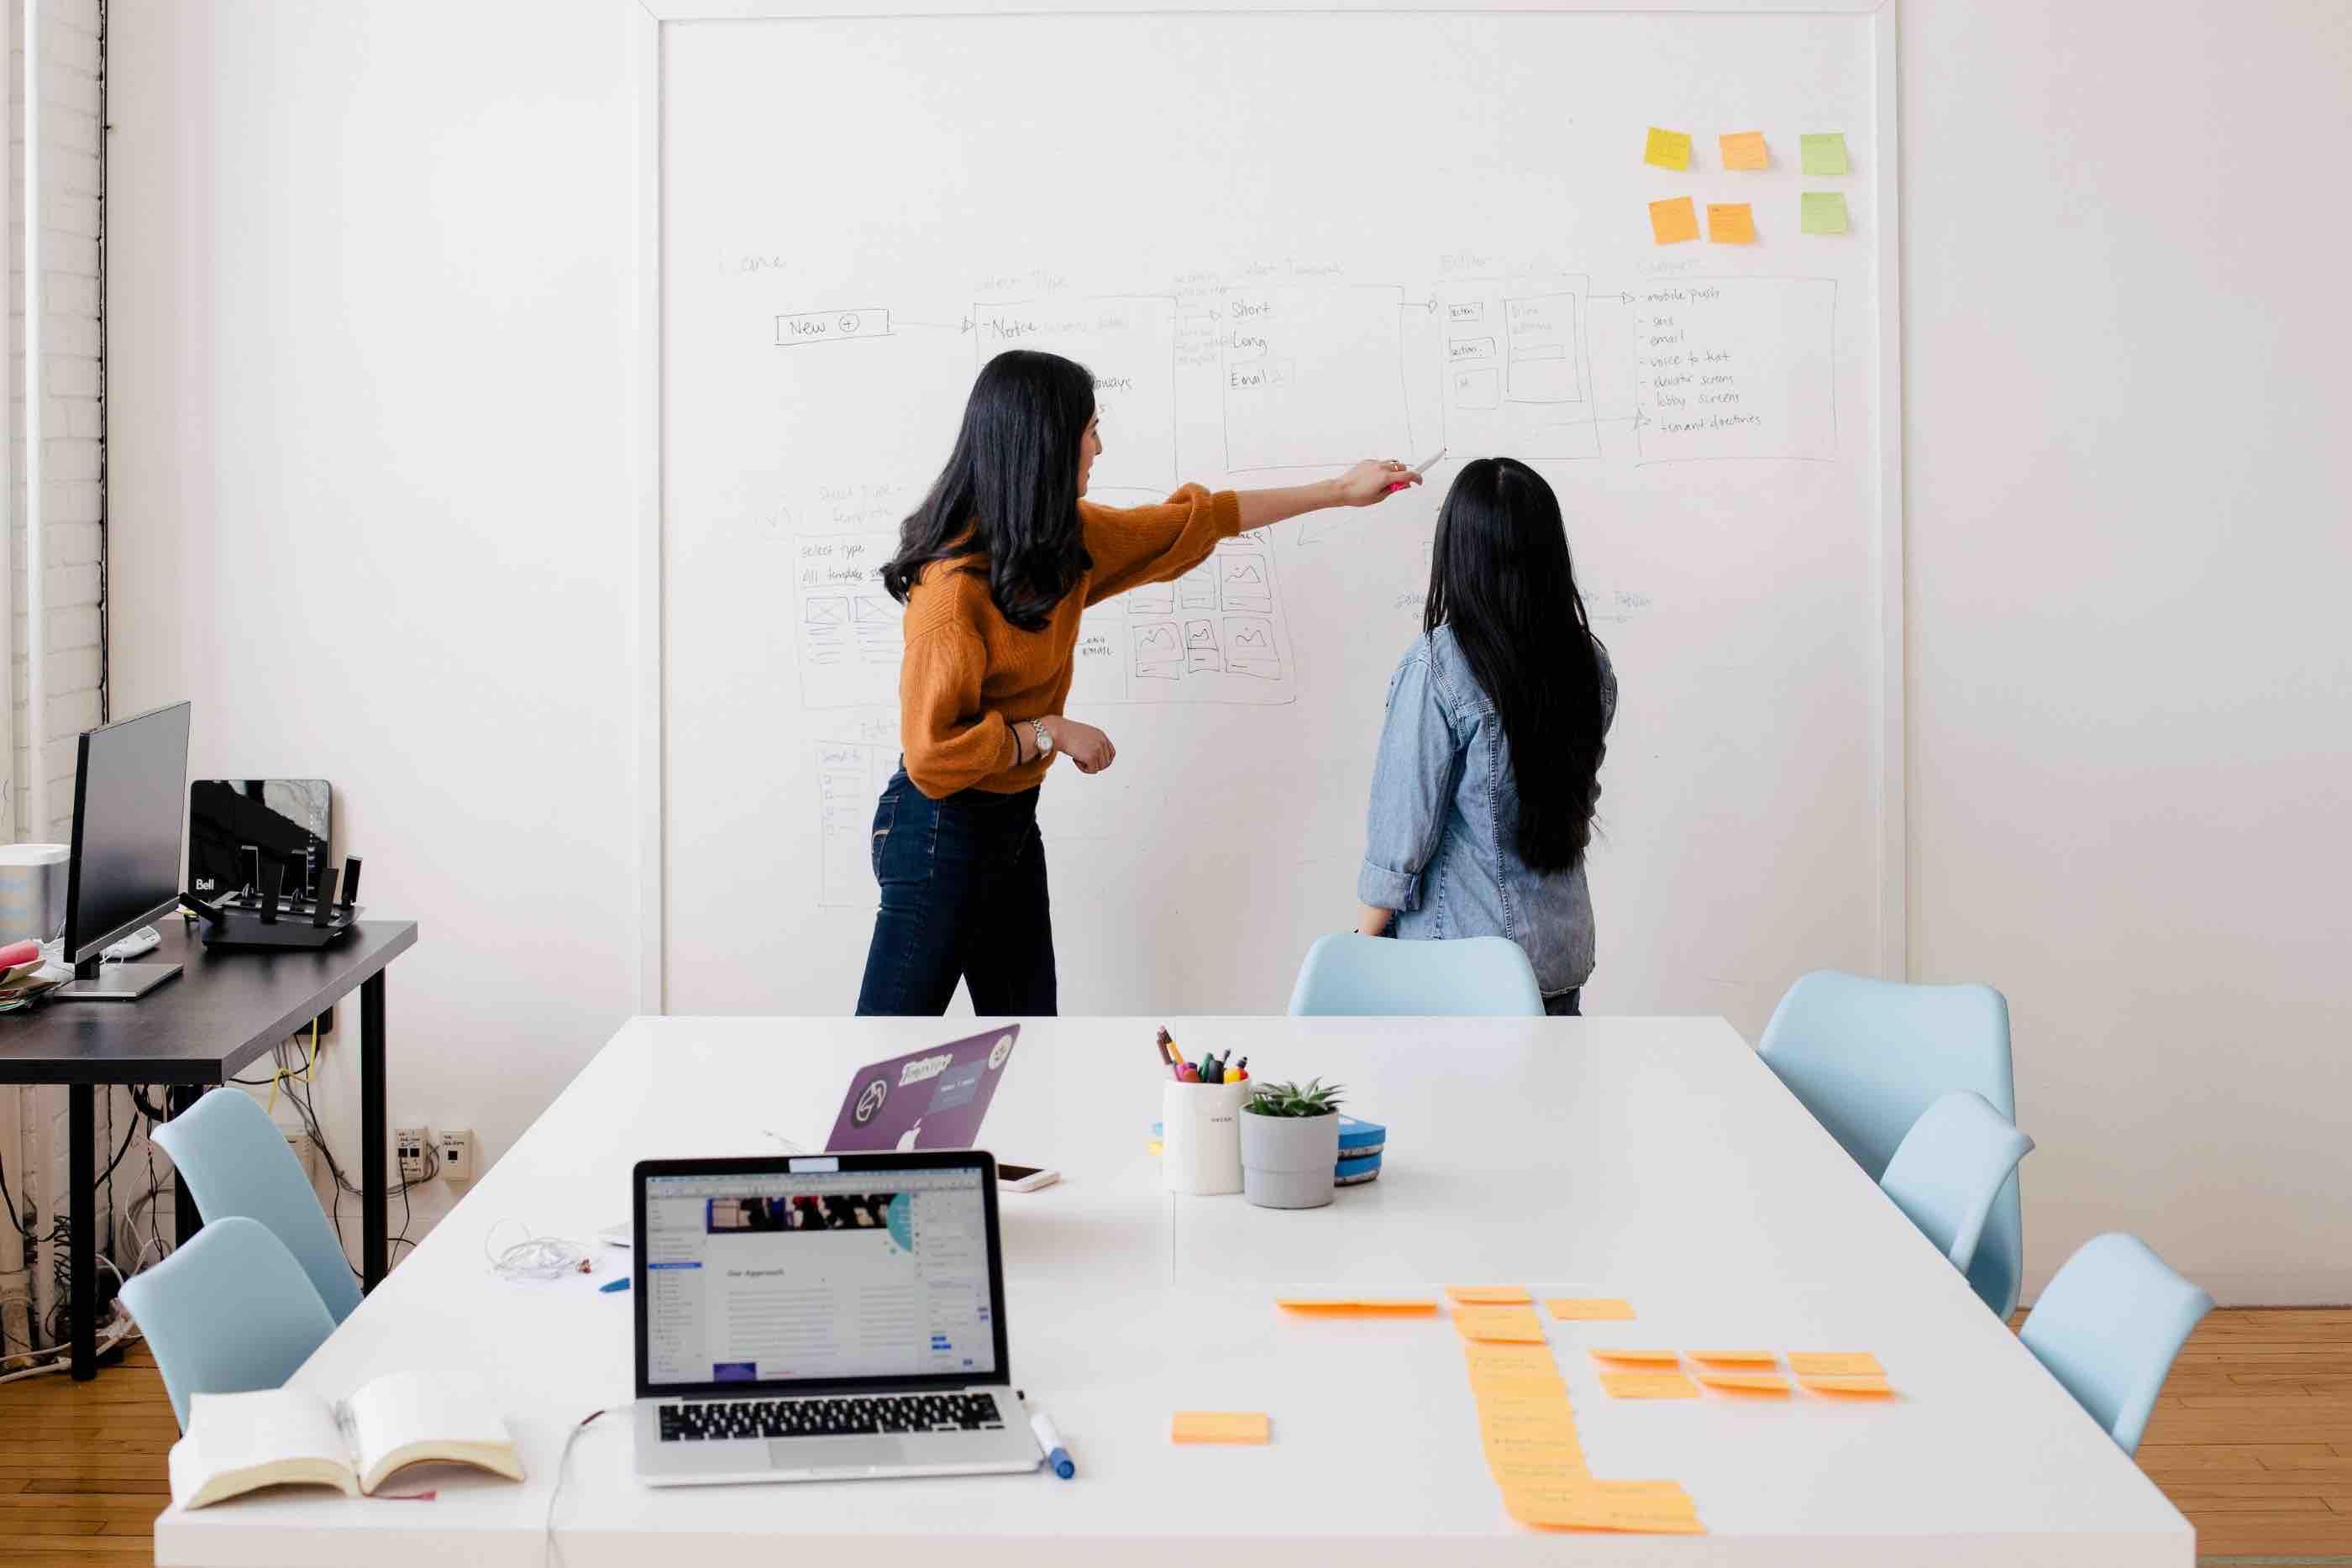 Teaching as a second career